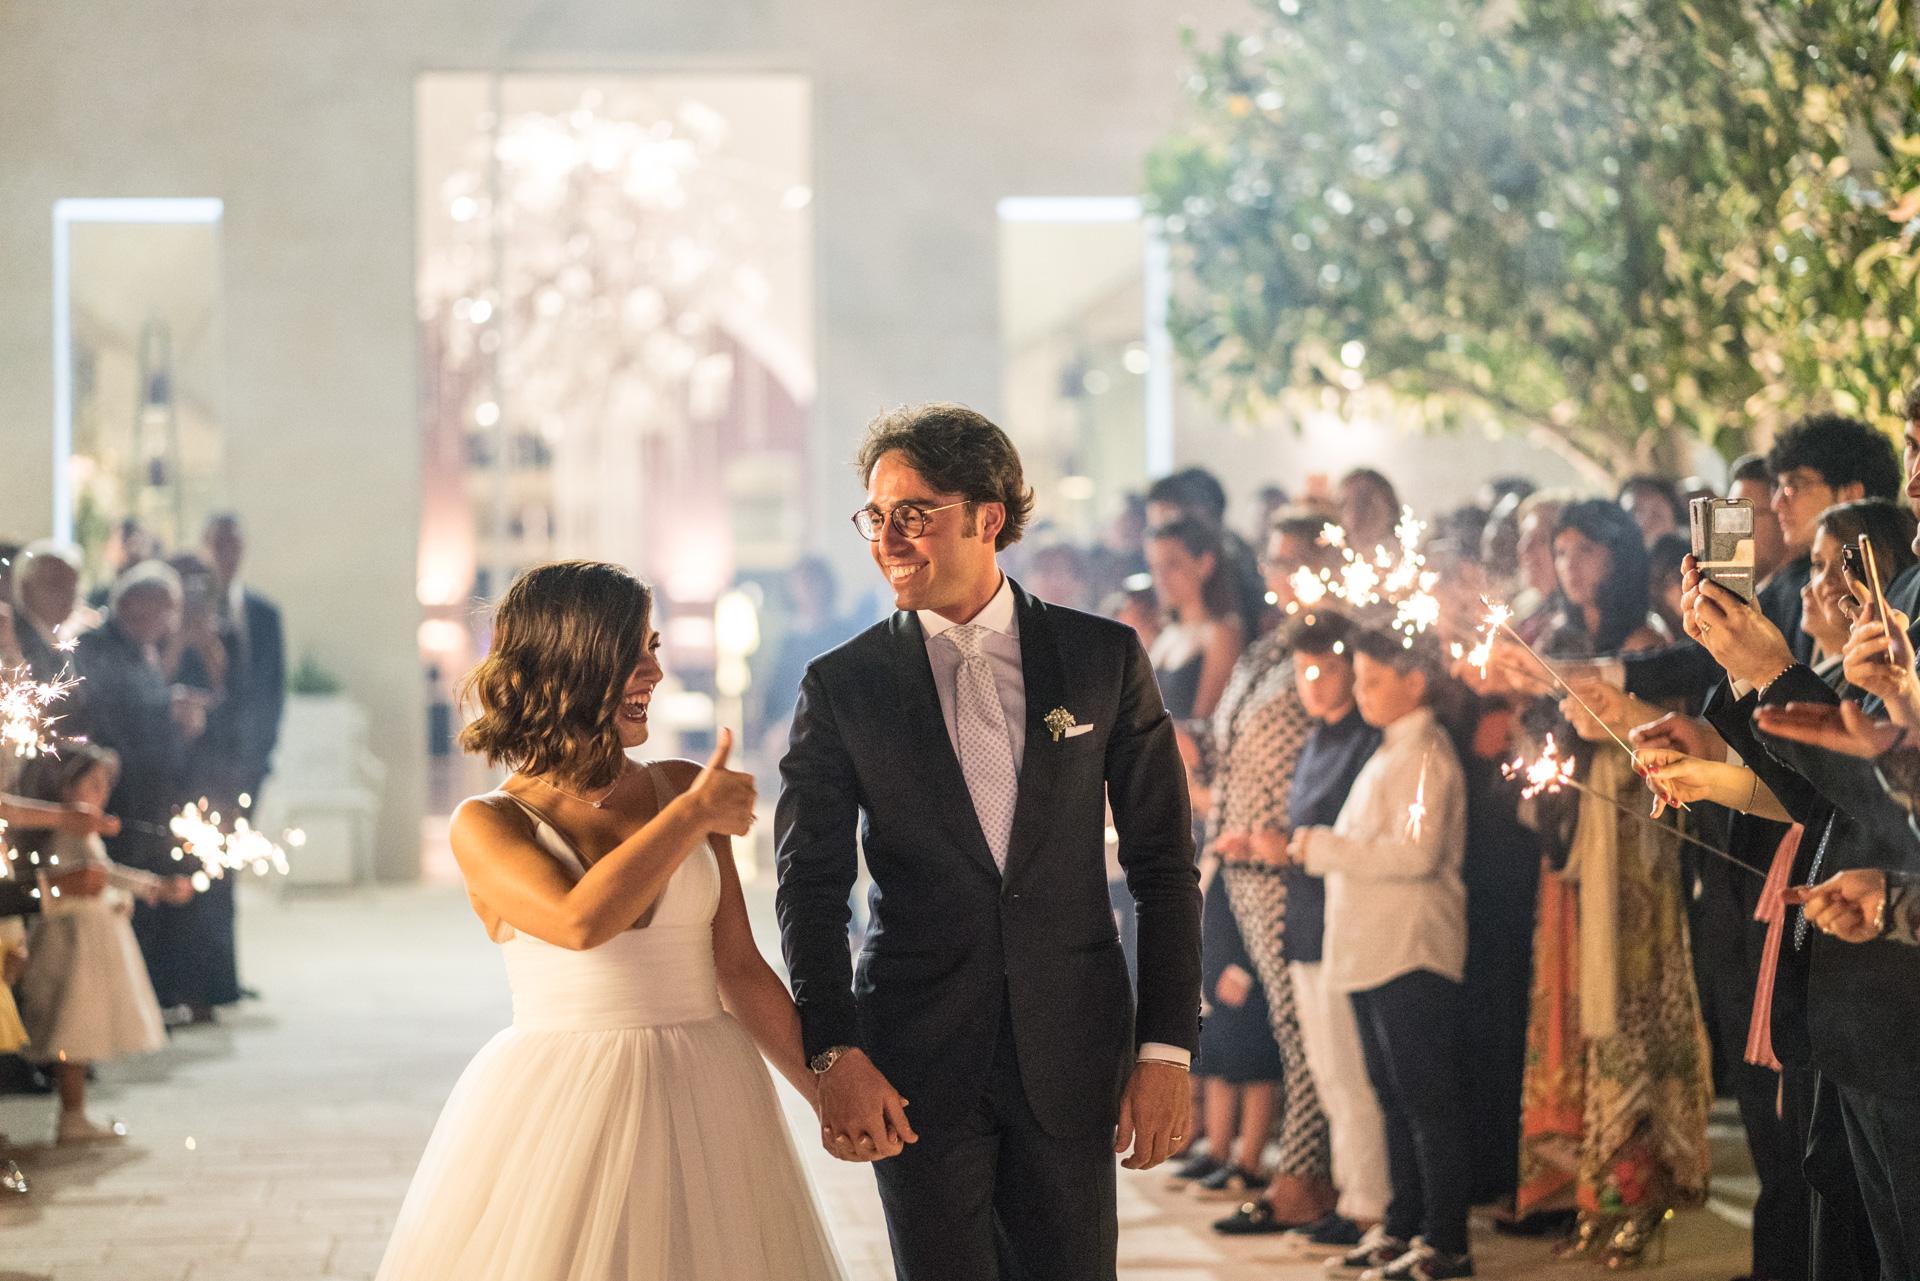 merafina photographer alfonso merafina fotografo wedding matrimonio andria francesca e antonio (27)